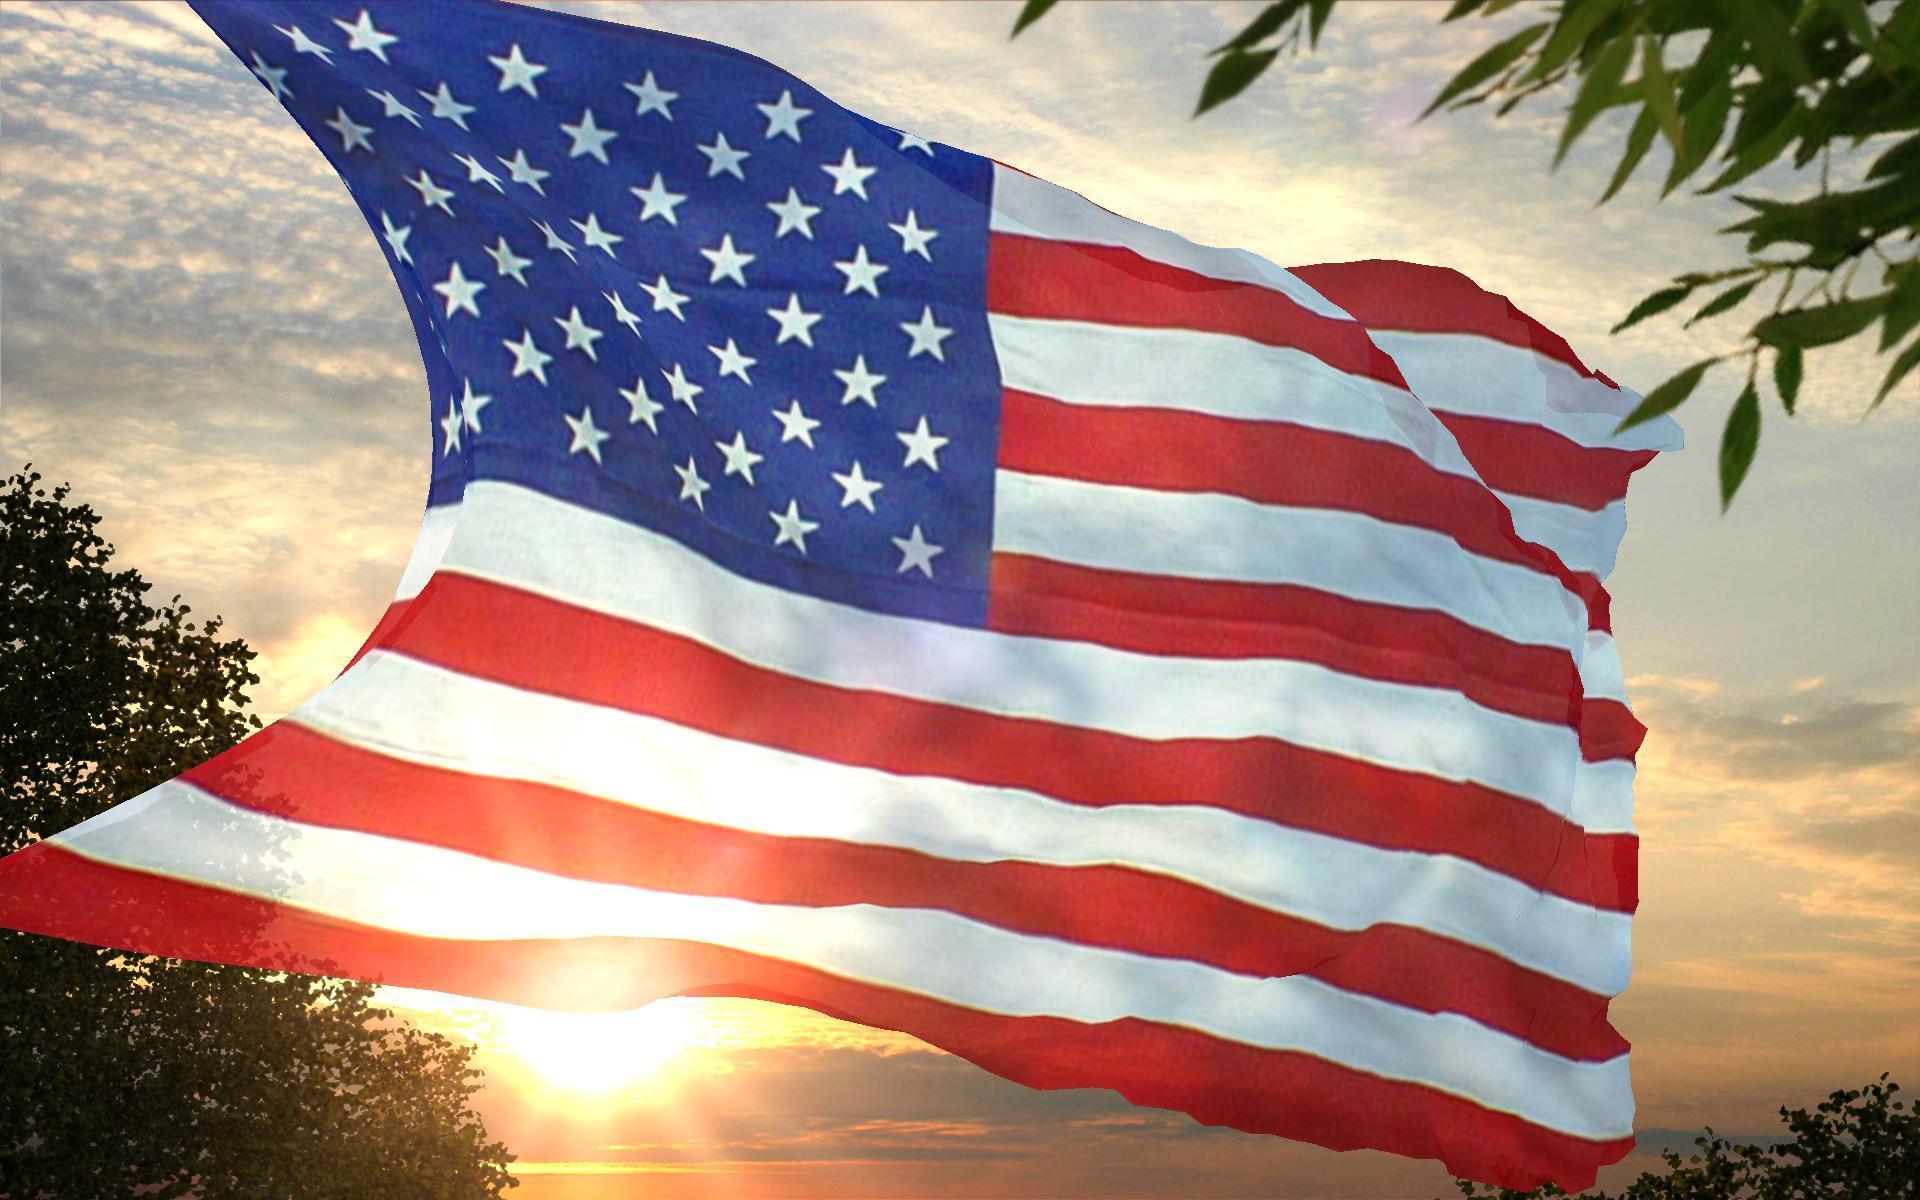 100+ American Flag wallpaper Images for nation lover